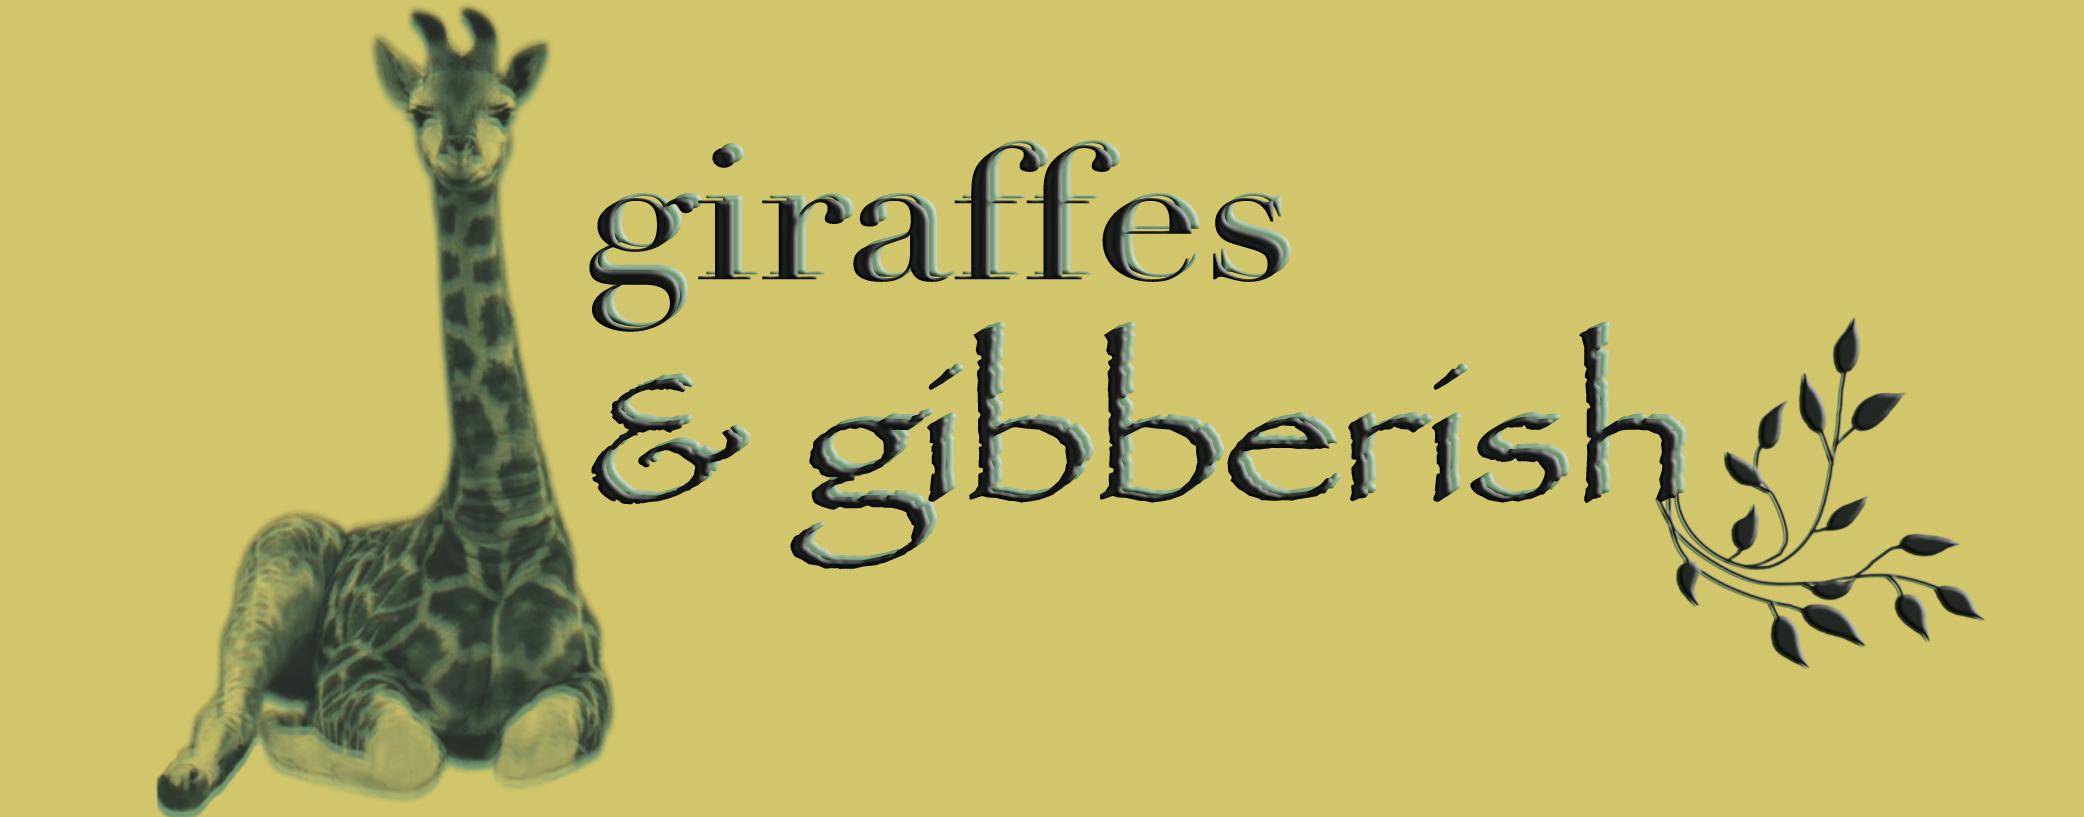 giraffes & gibberish